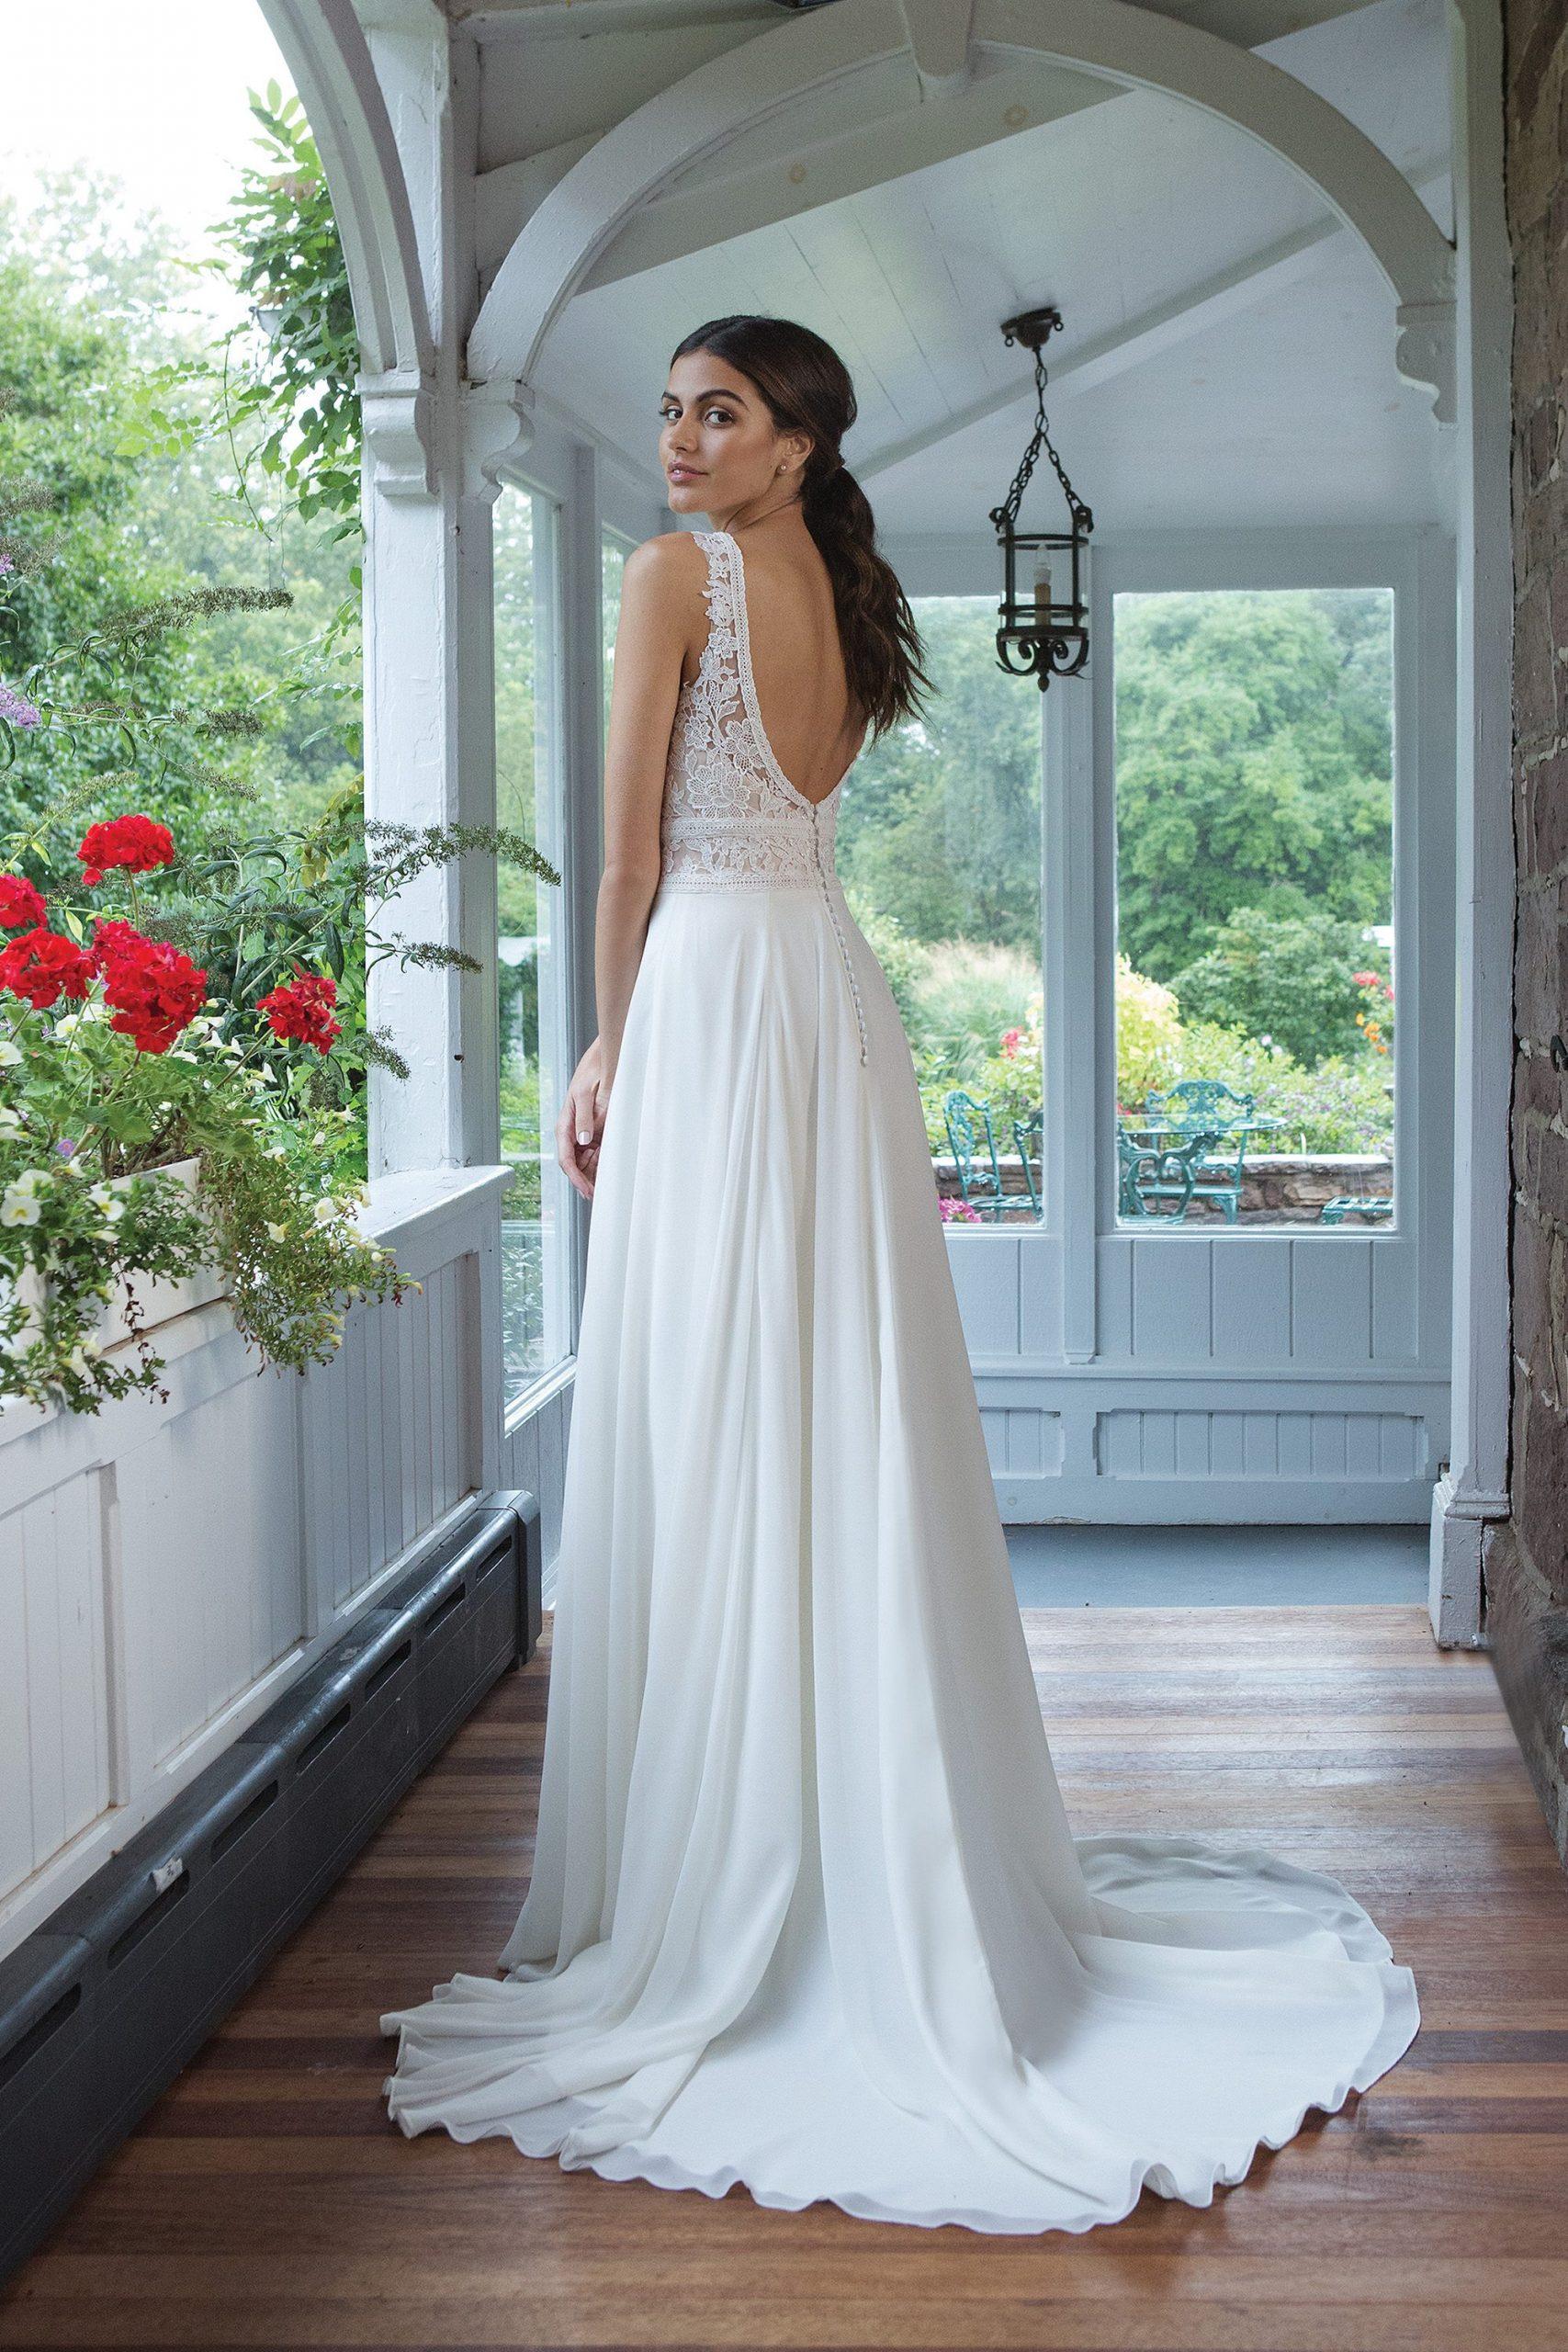 Boho Hochzeitskleid Mit Linearen Details  Sweetheart 11047